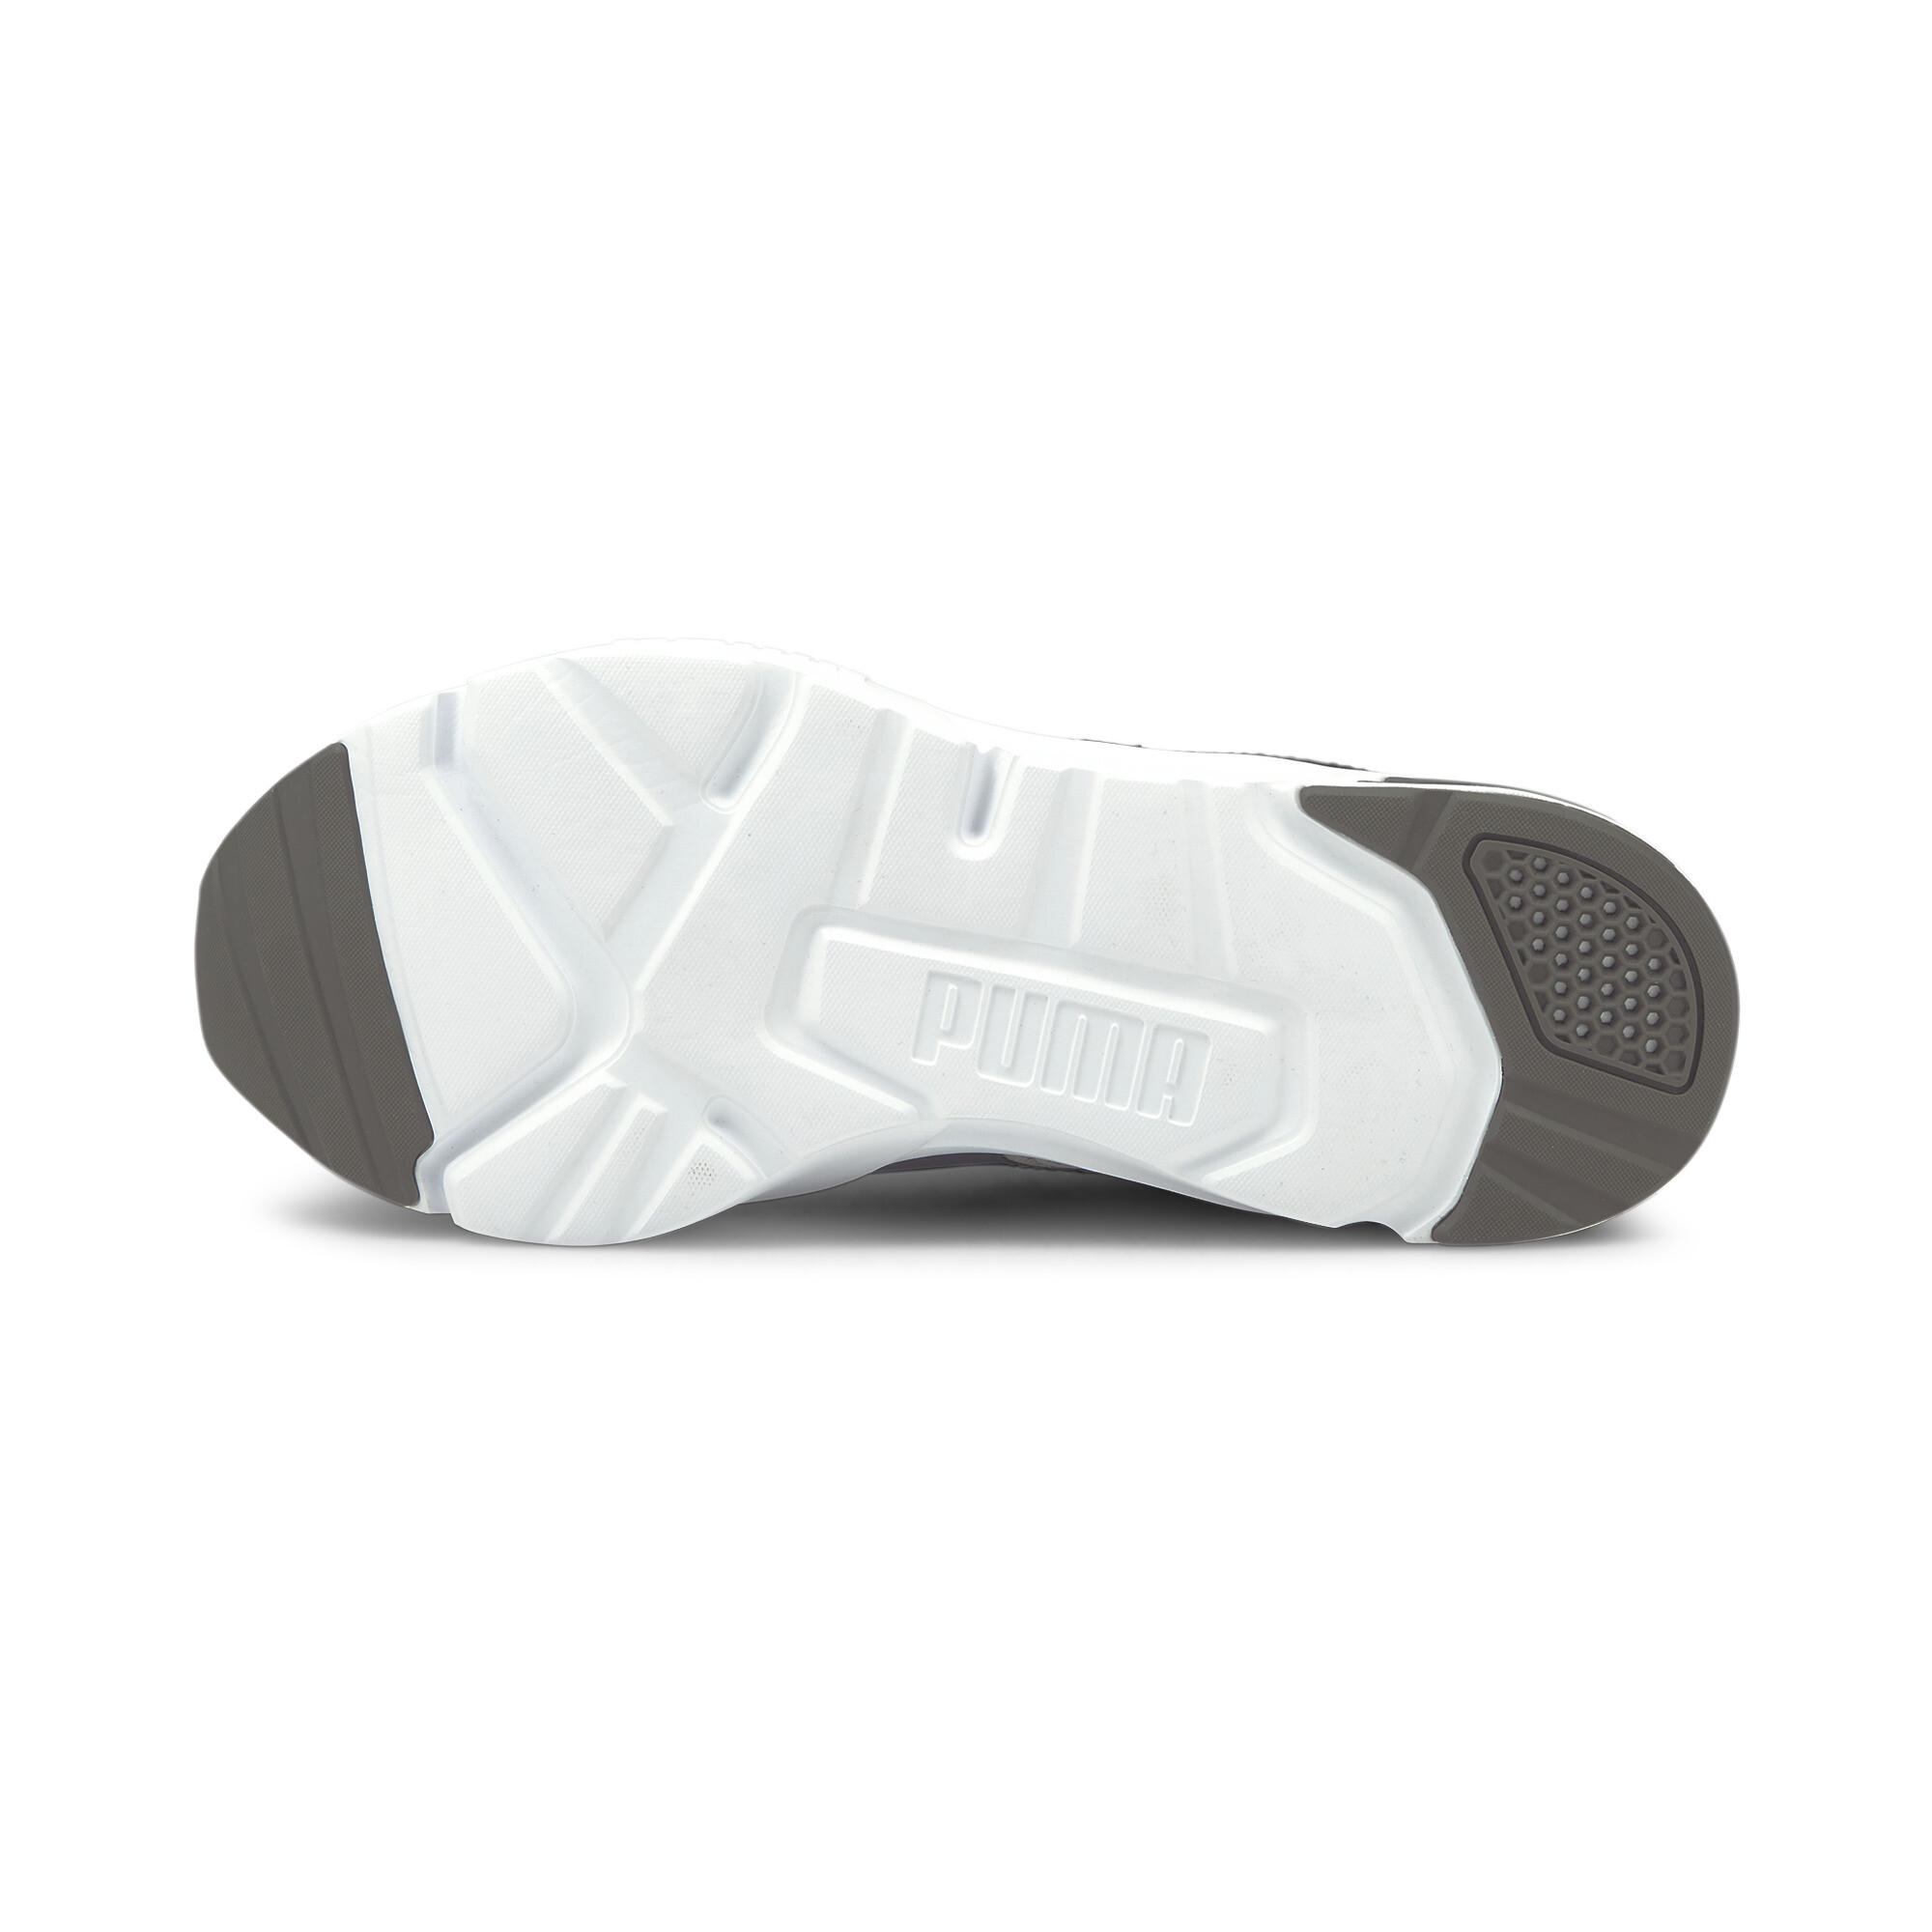 thumbnail 49 - PUMA Men's CELL Pharos Training Shoes